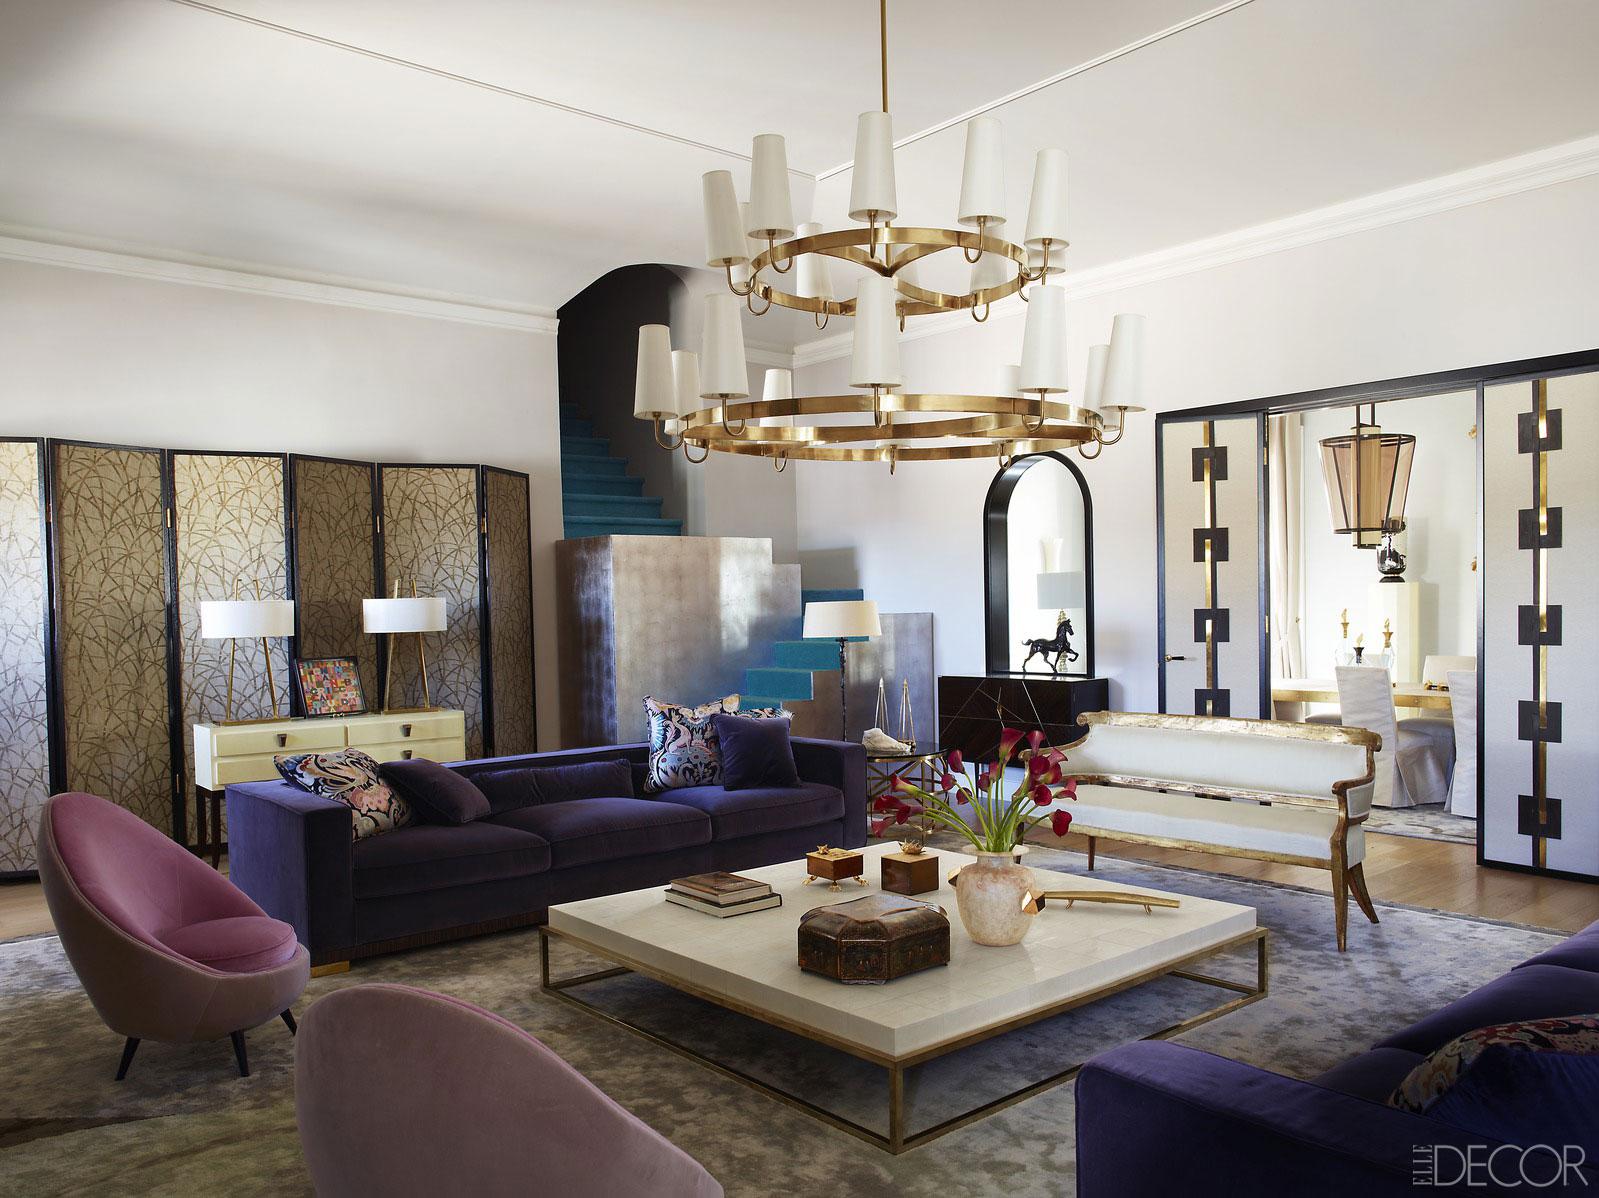 Italian palazzo home tour family friendly apartment in italy for Blog interior design italia